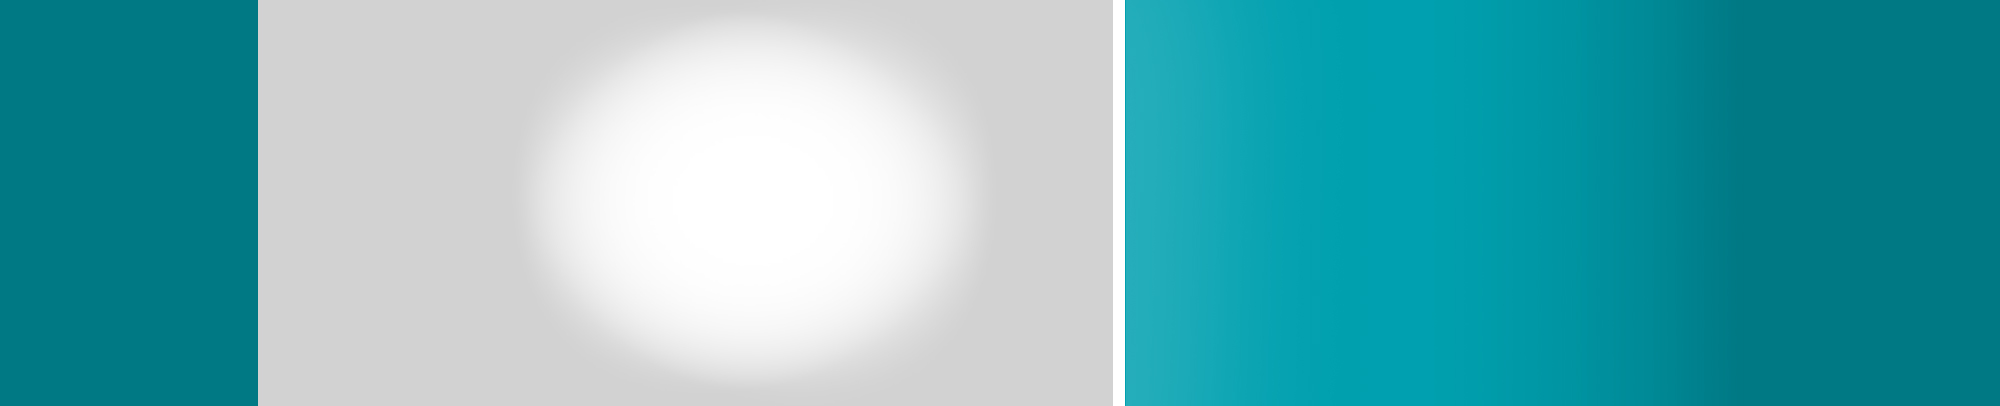 Clenz-a-dent_Slider-Background3c